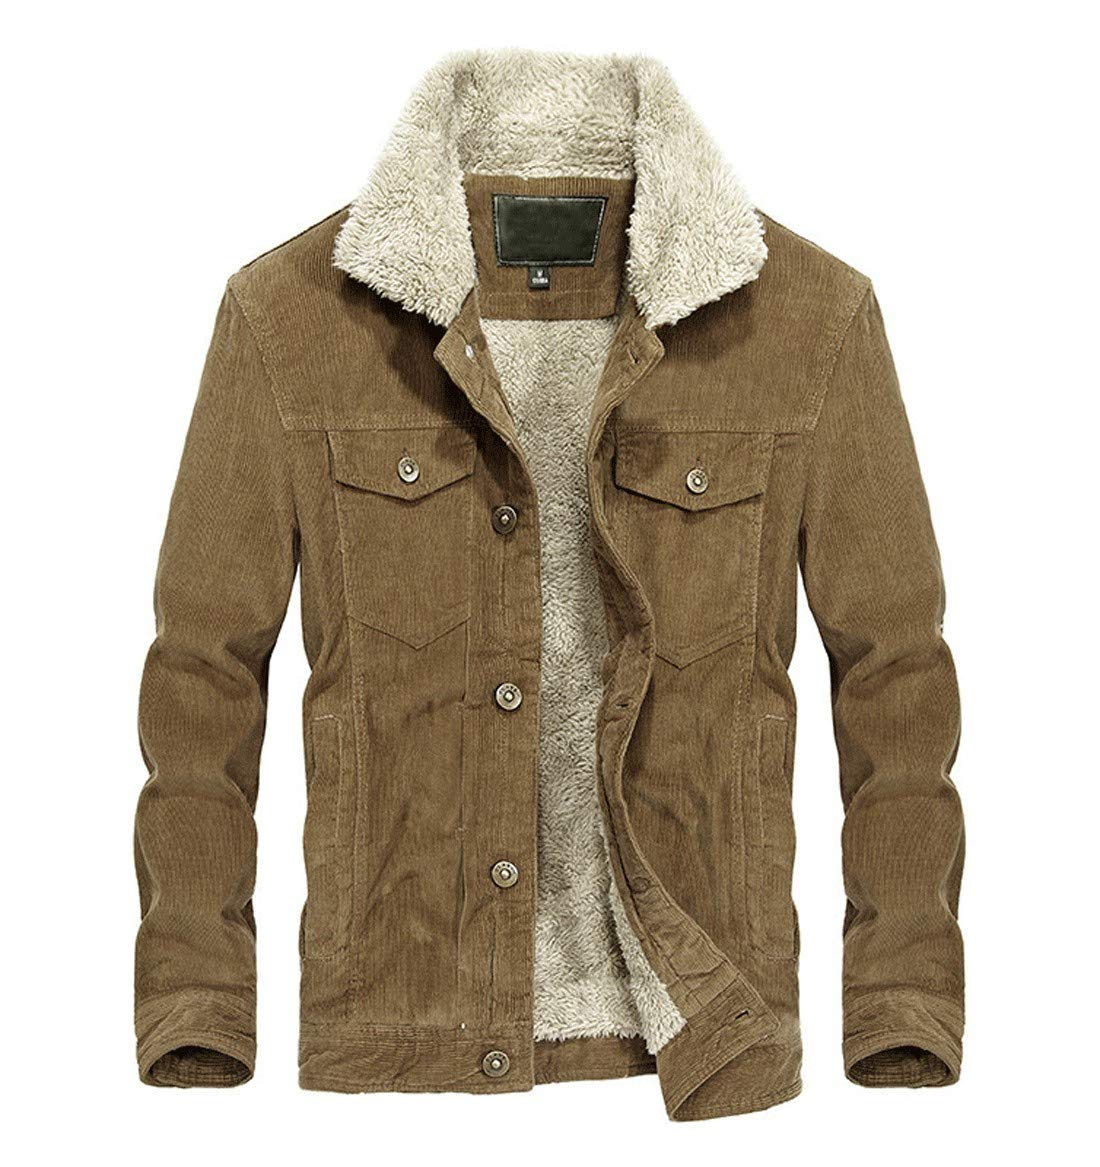 CHARTOU Men's Vintage Button-Front Sherpa Lined Shearling Slim Fit Corduroy Denim Jacket (Large, Khaki-Fleece) by CHARTOU